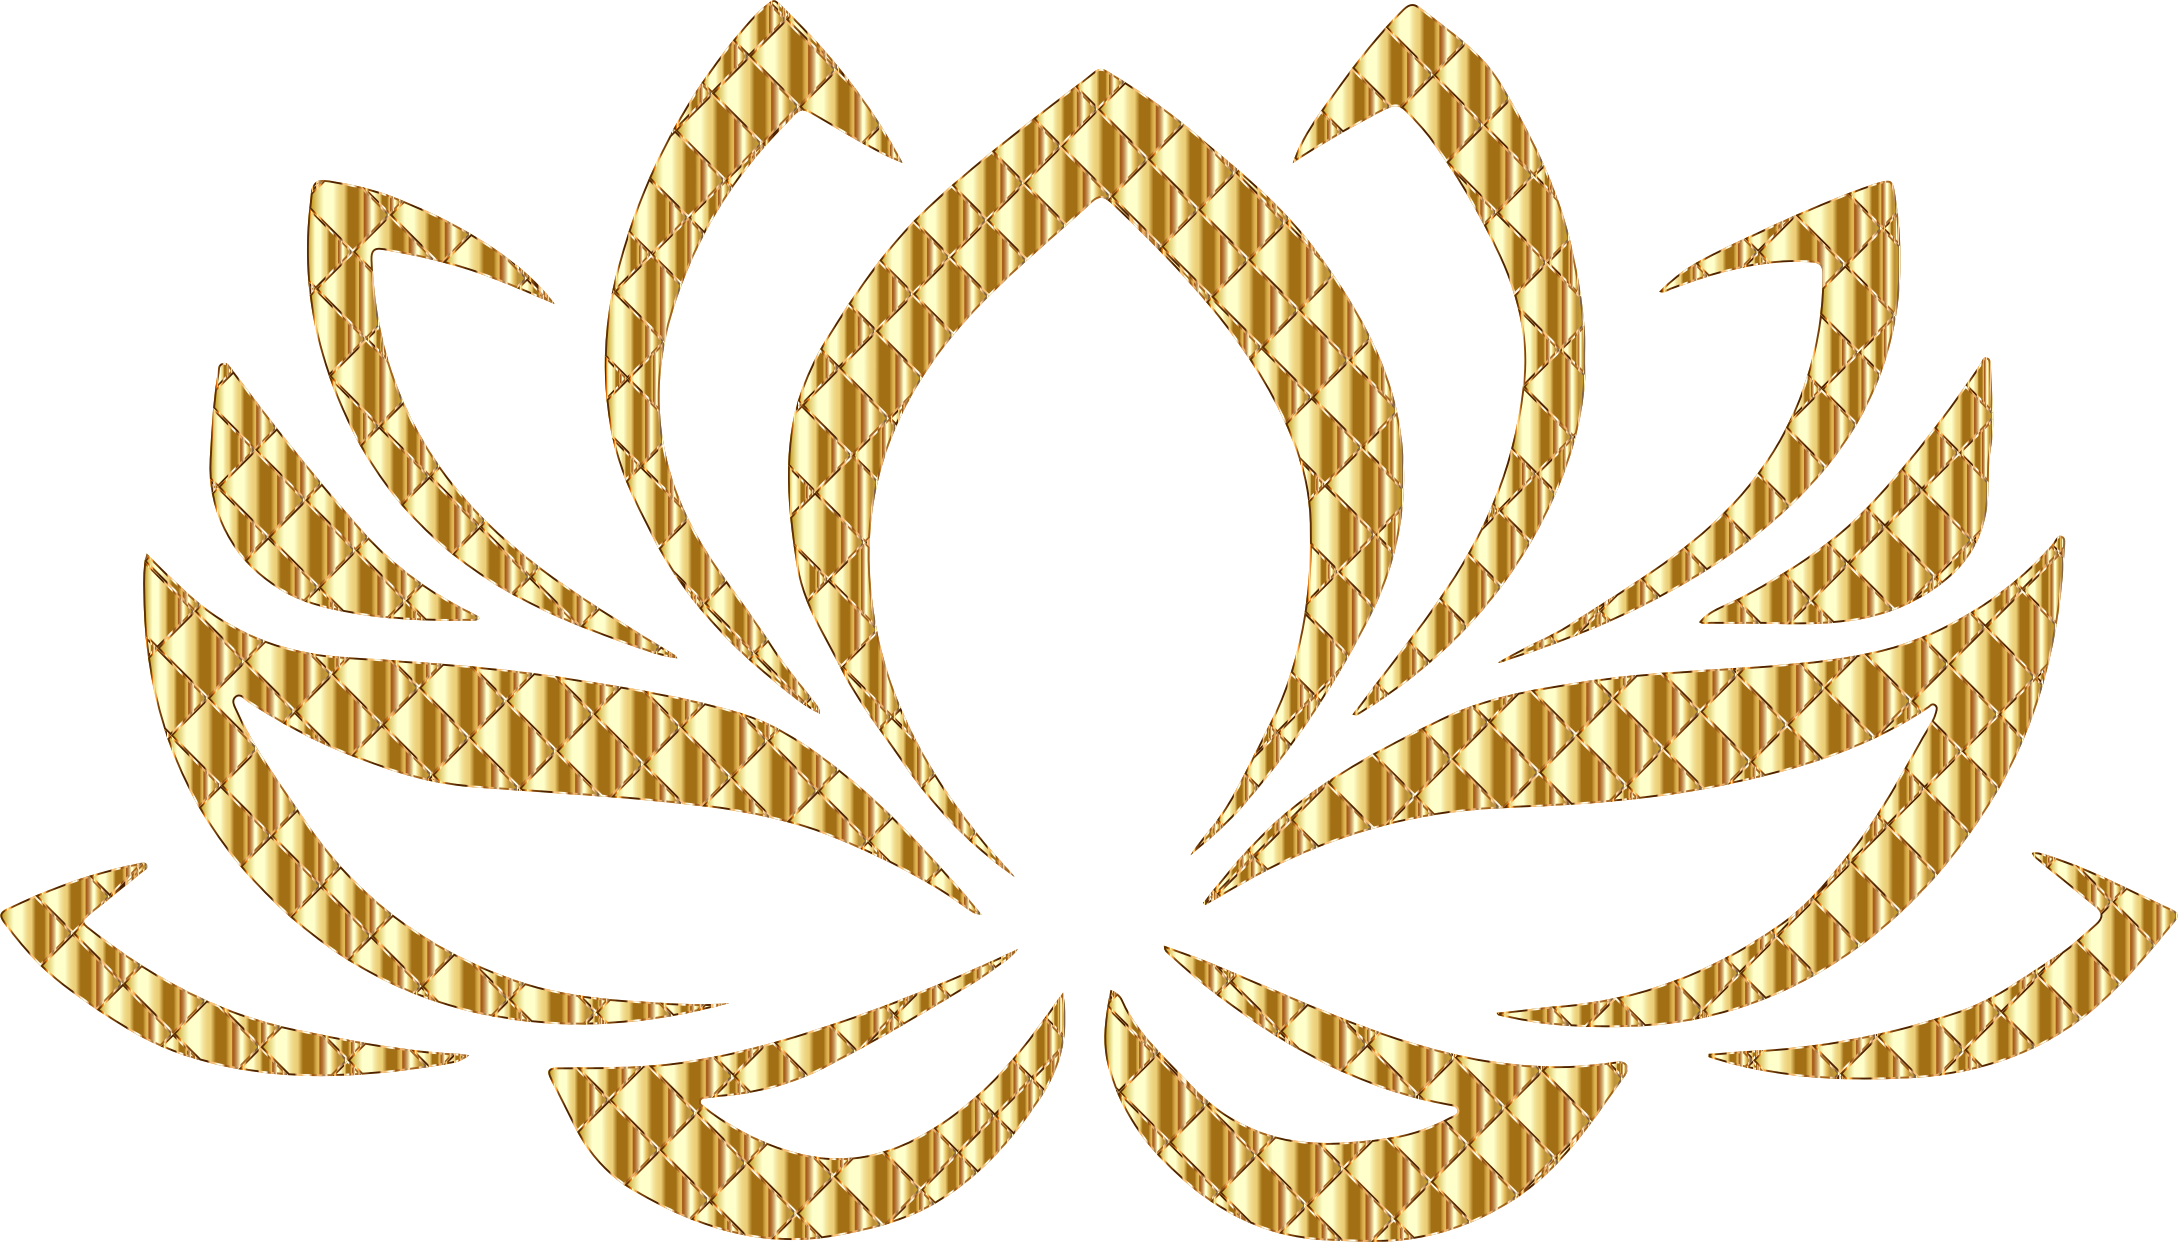 Gold clipart transparent background. Lotus inc emblems for